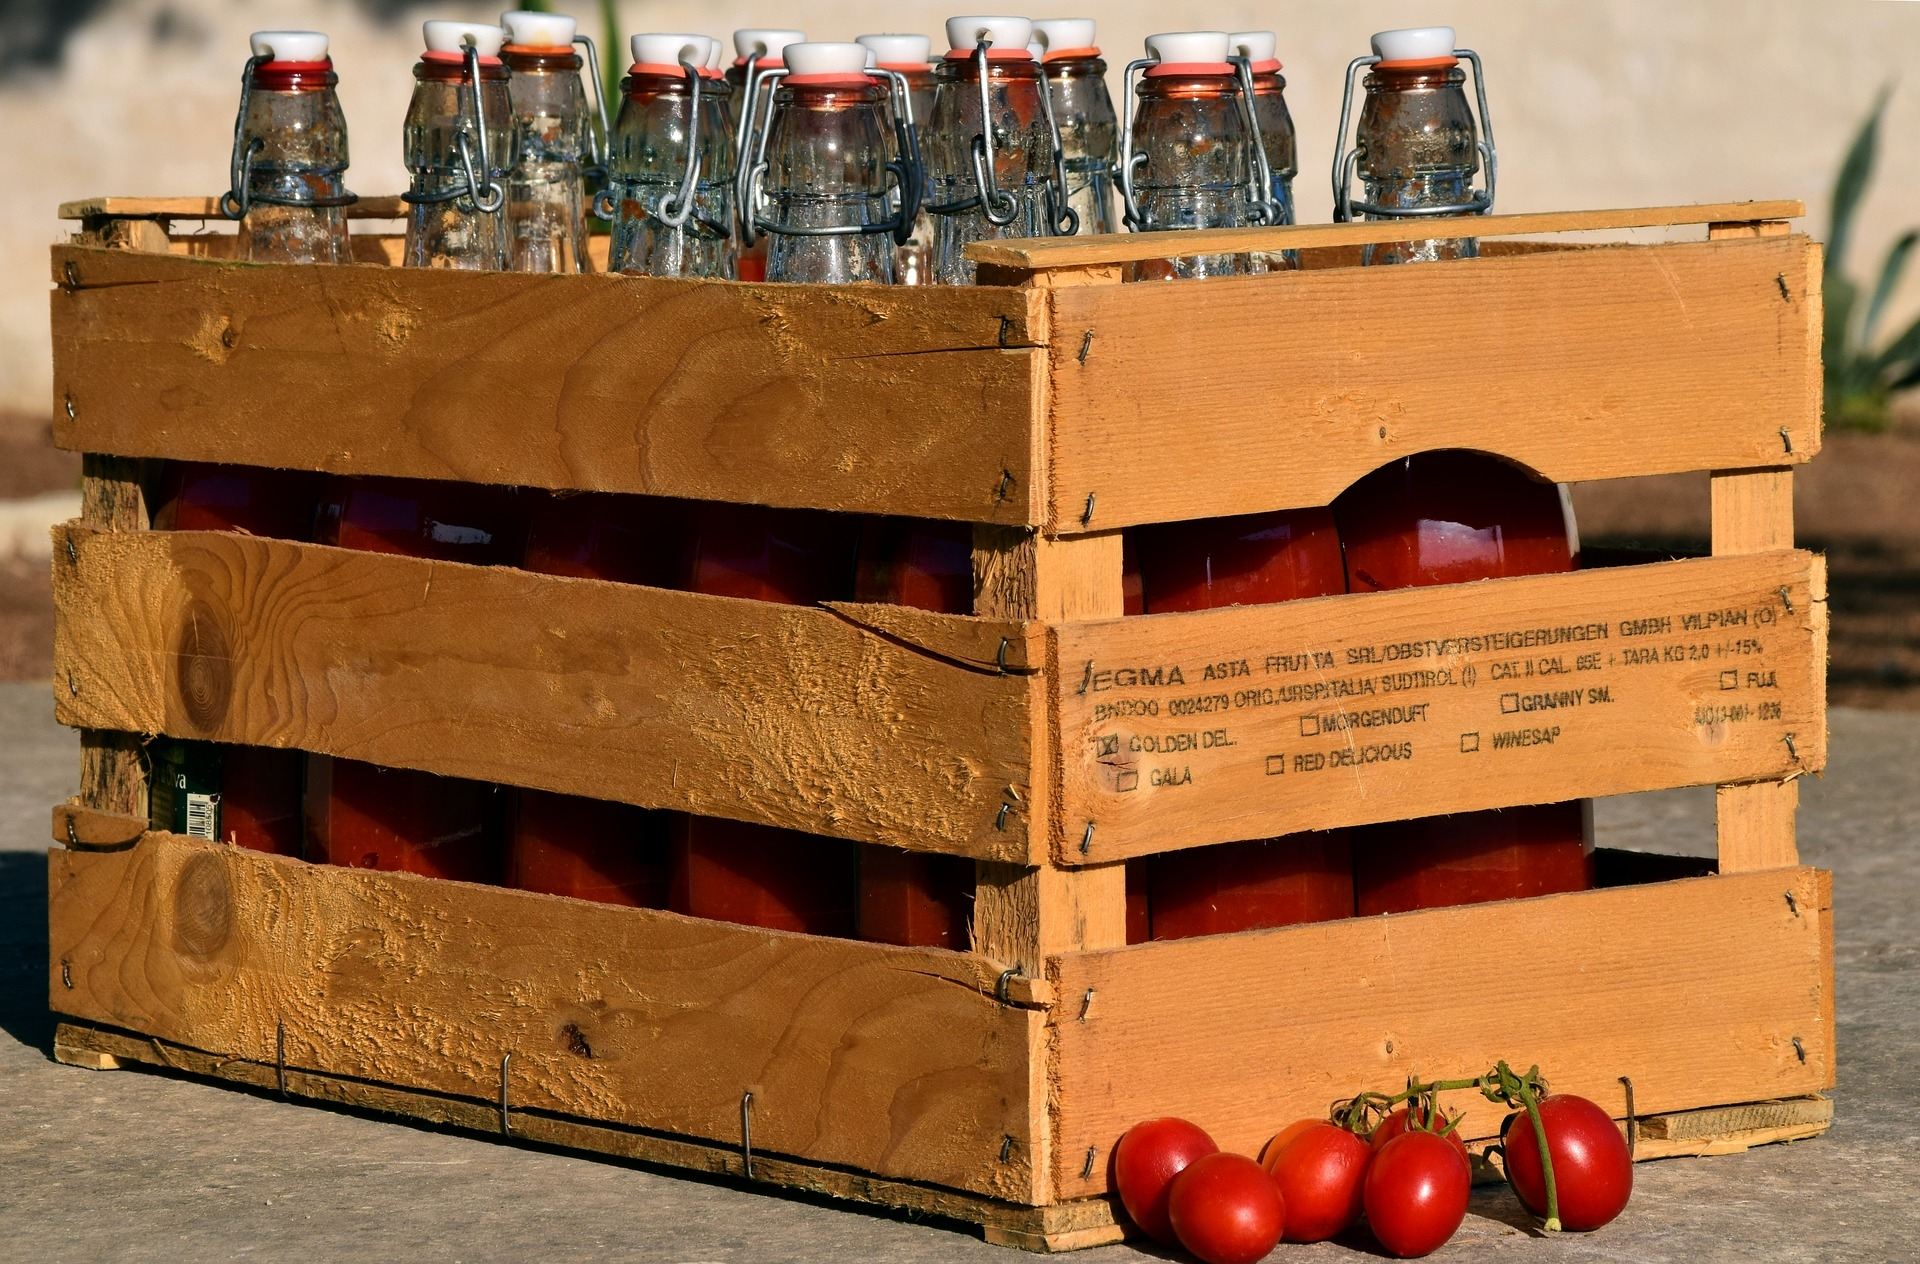 tomatoes-2670975_1920.jpg